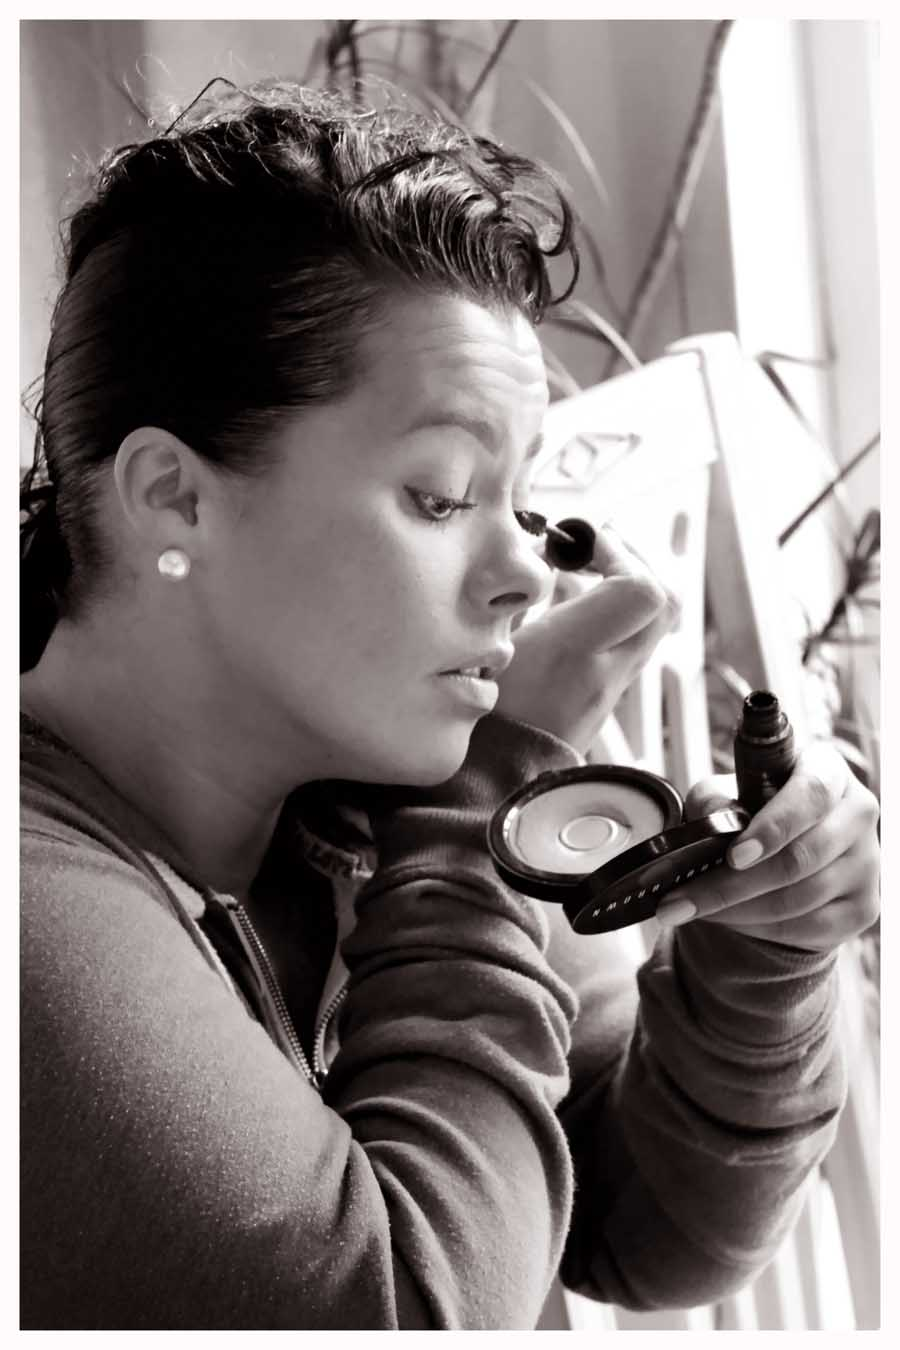 GETTING READY photos by Simeon Thaw copyright 2014 (55).jpg